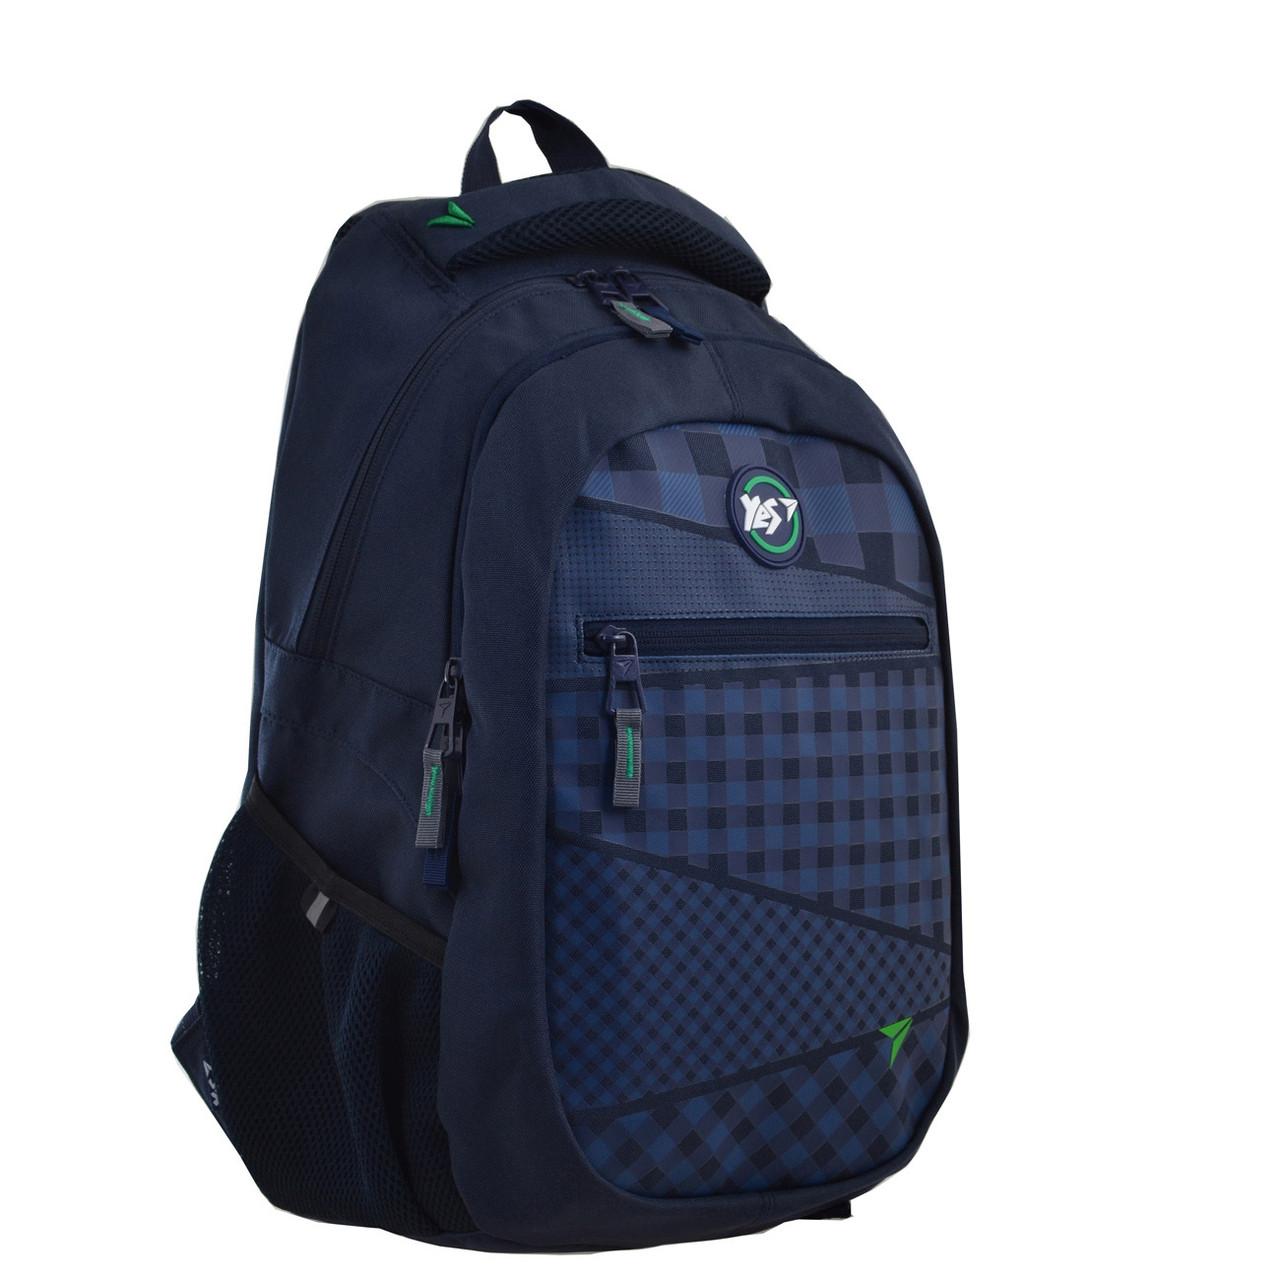 Рюкзак школьный YES T-23 Scotland Classic код: 556992